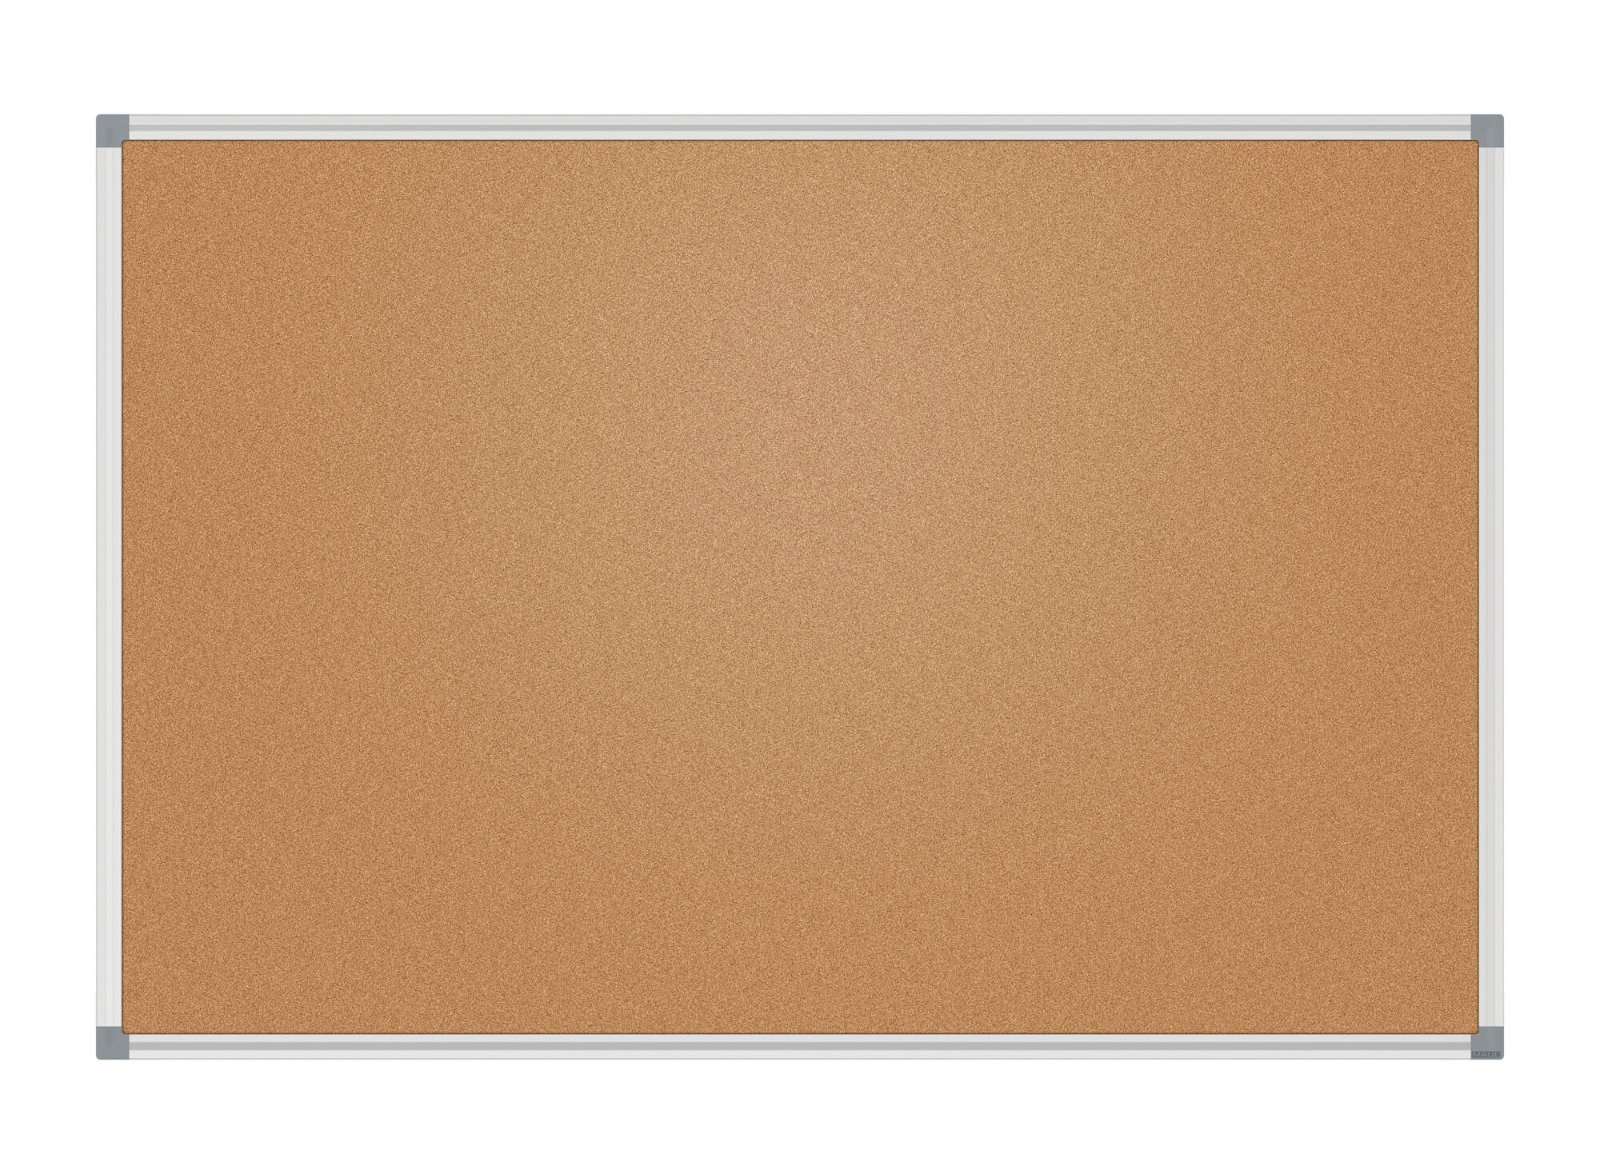 Pinnboard MAULstandard, 90x180 cm, Kork, grau